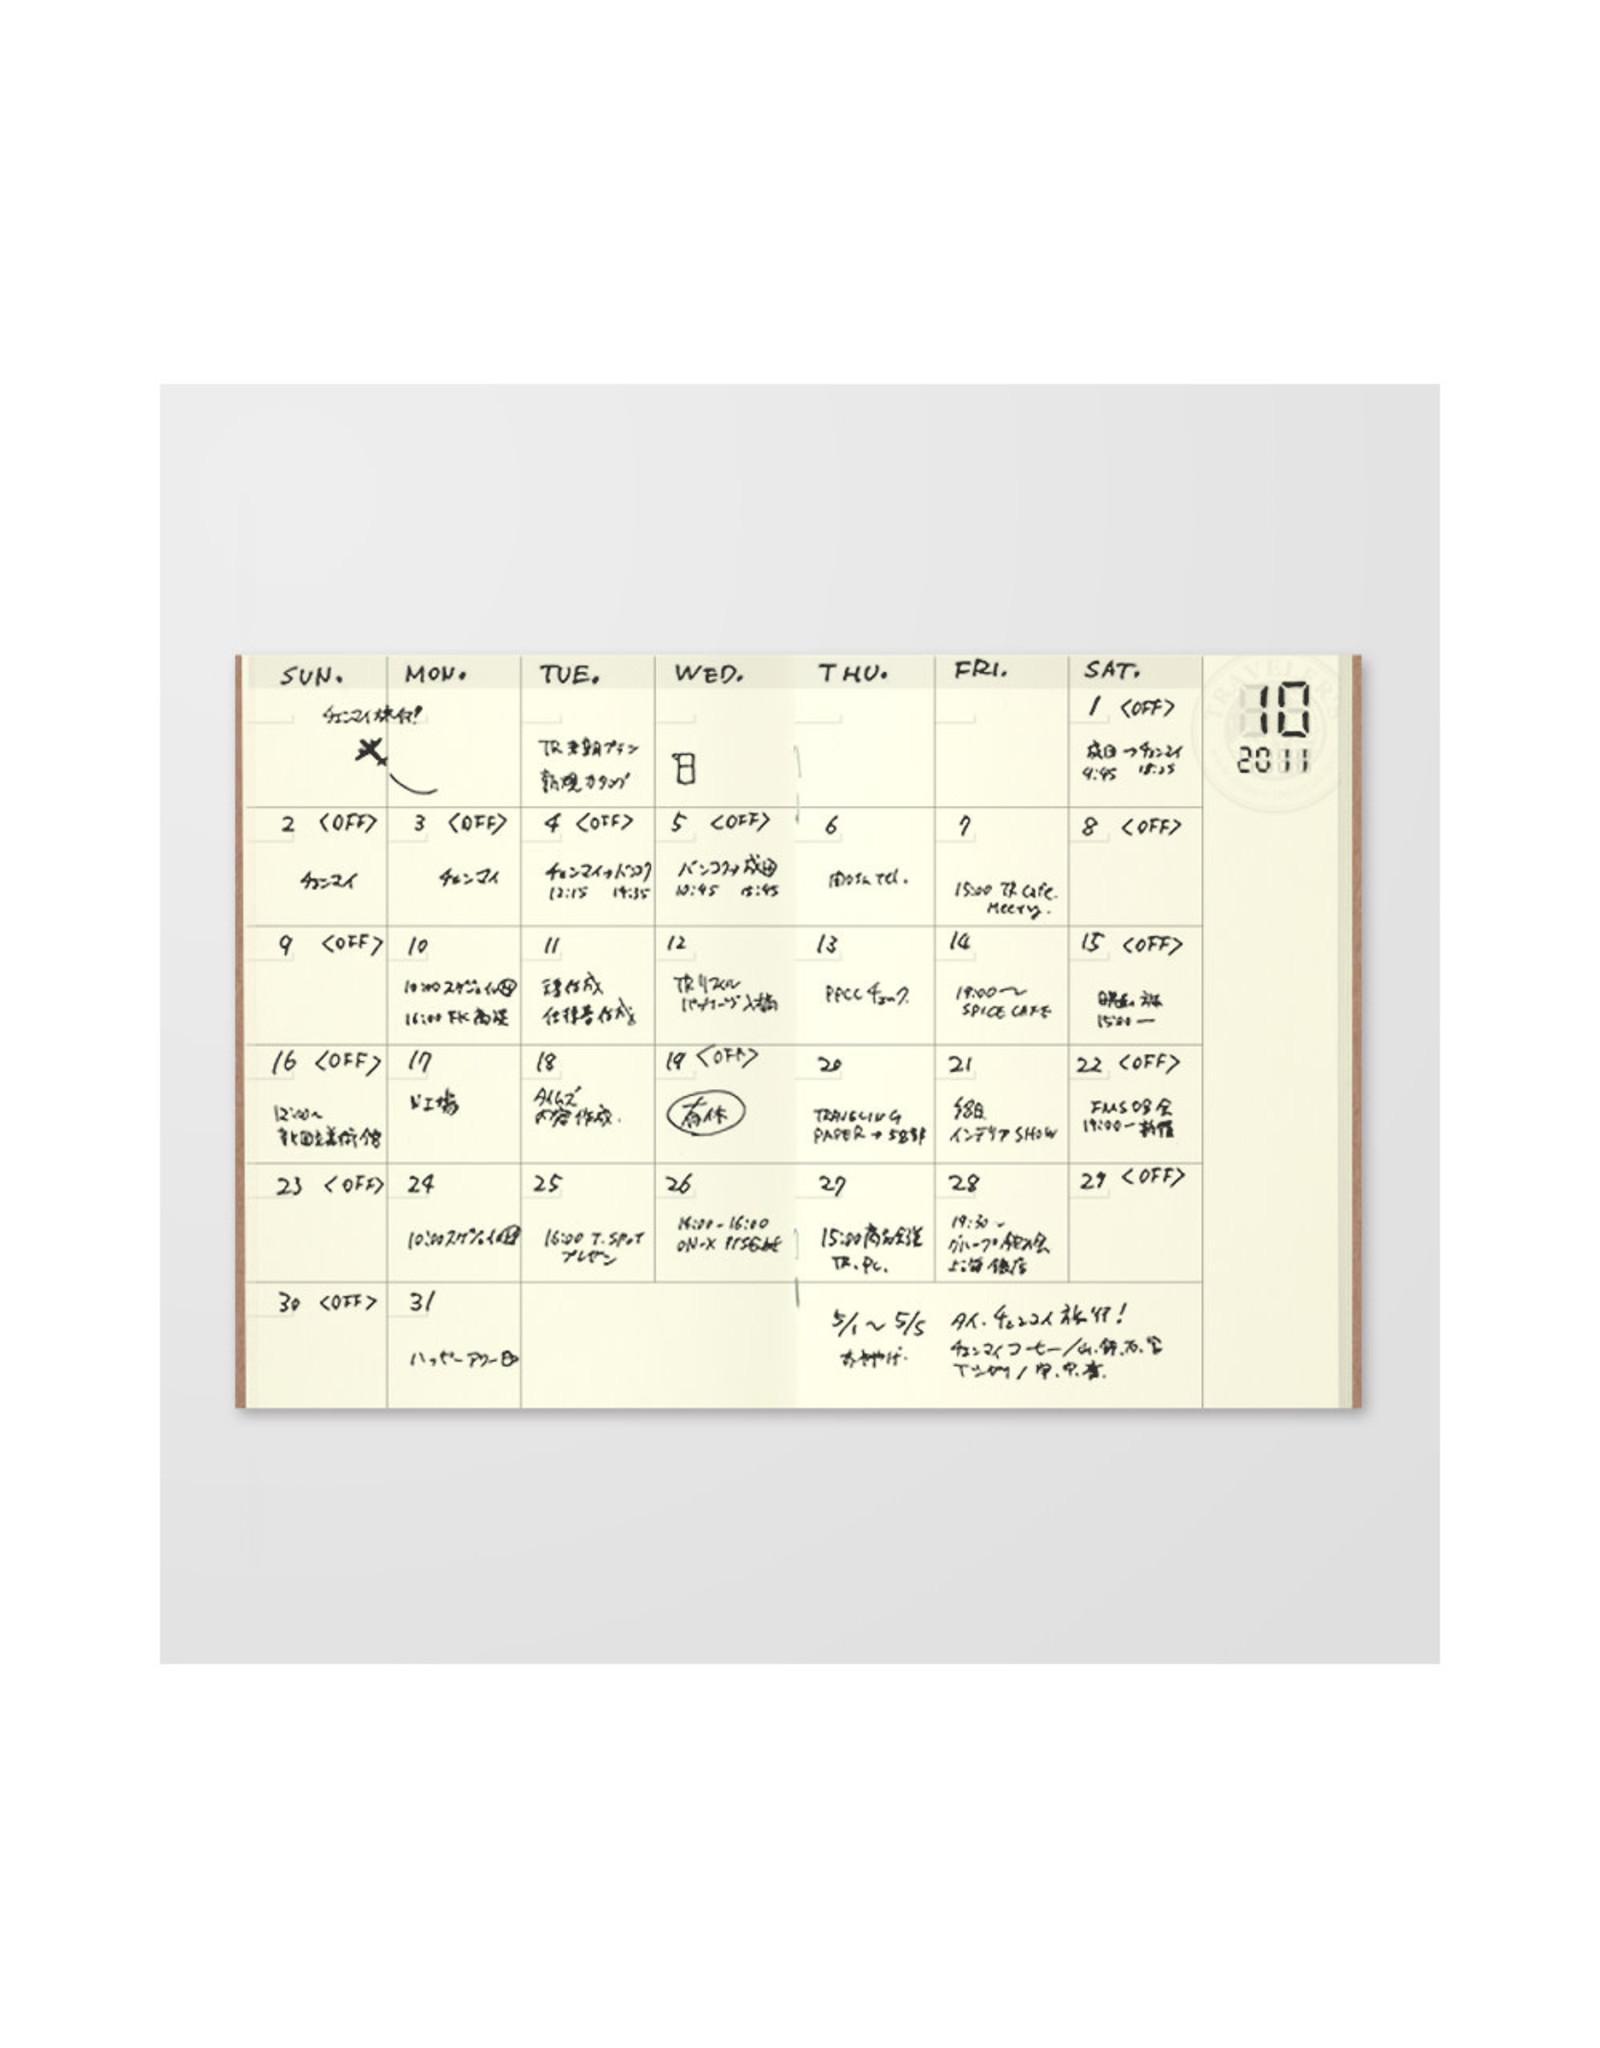 Traveler's Company 006. FREE DIARY MONTHLY MIDORI TRAVELER'S NOTEBOOK PASSPORT SIZE